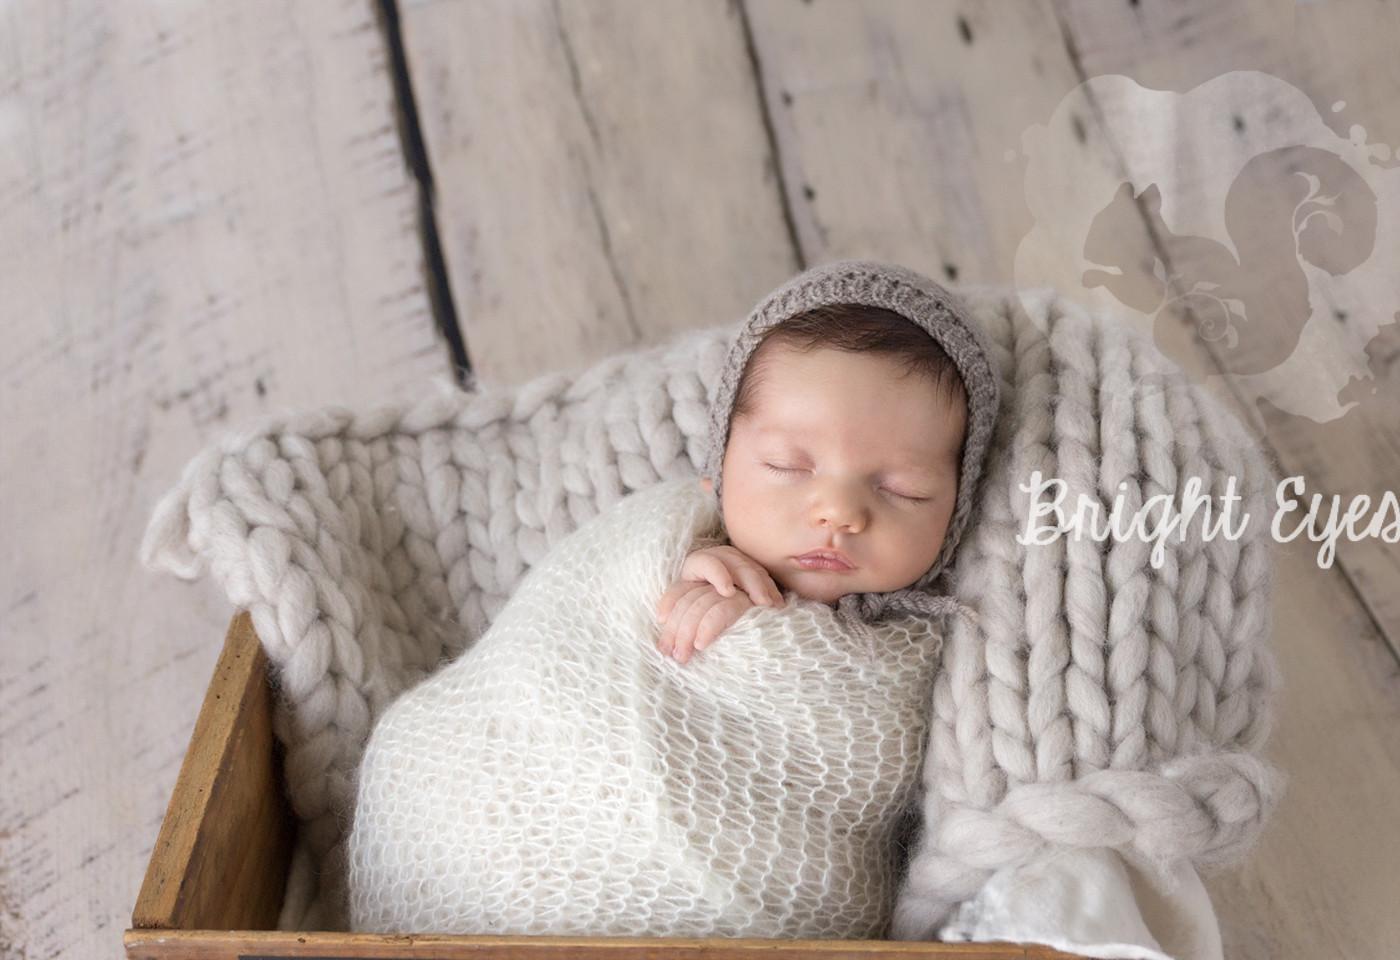 baby-in-butter-box.jpg